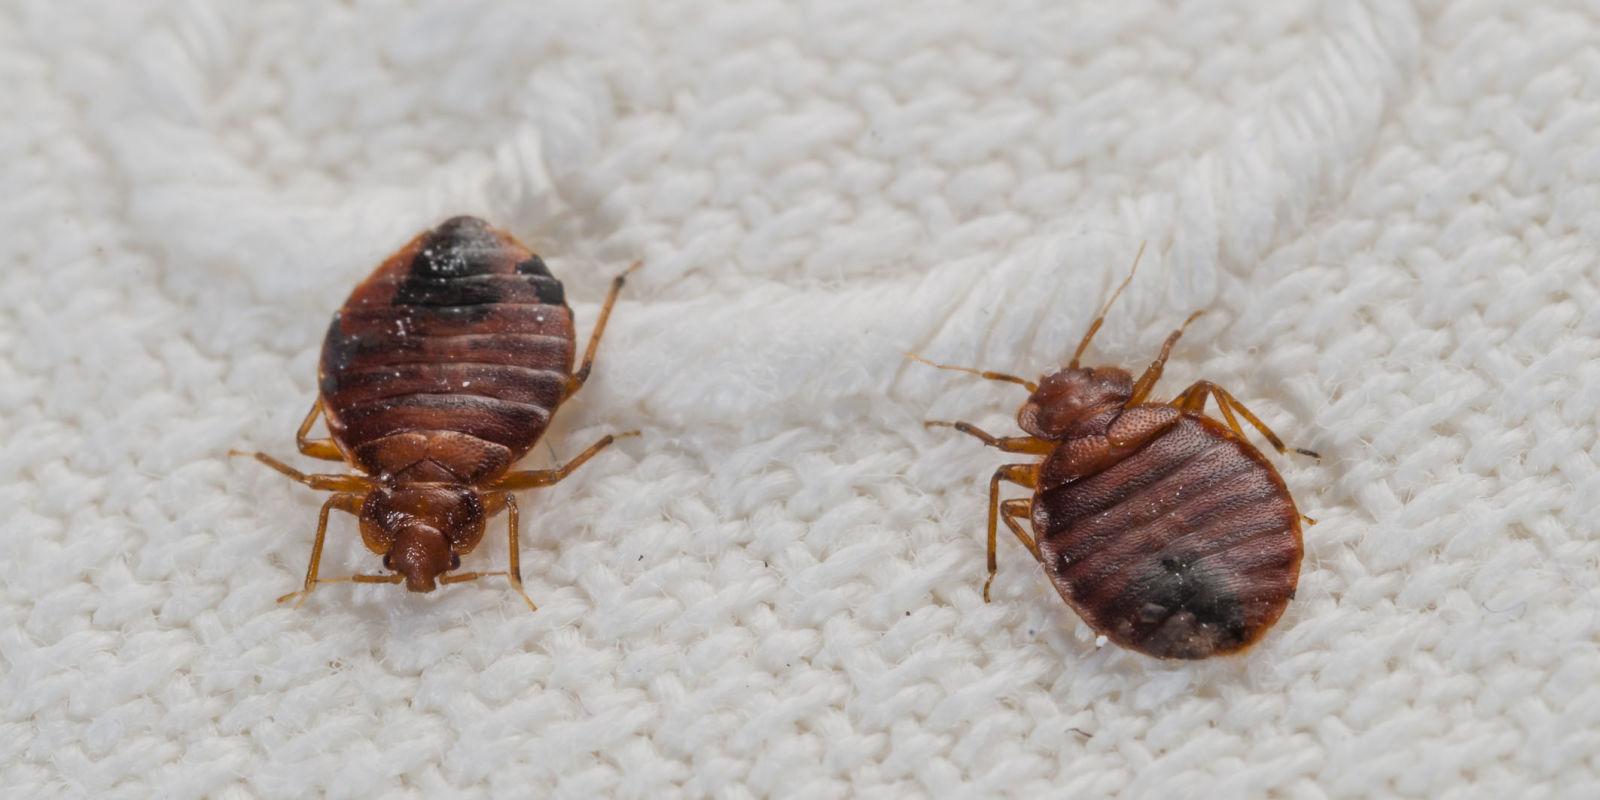 Baby bed bugs in bathroom - Baby Bed Bugs In Bathroom 13